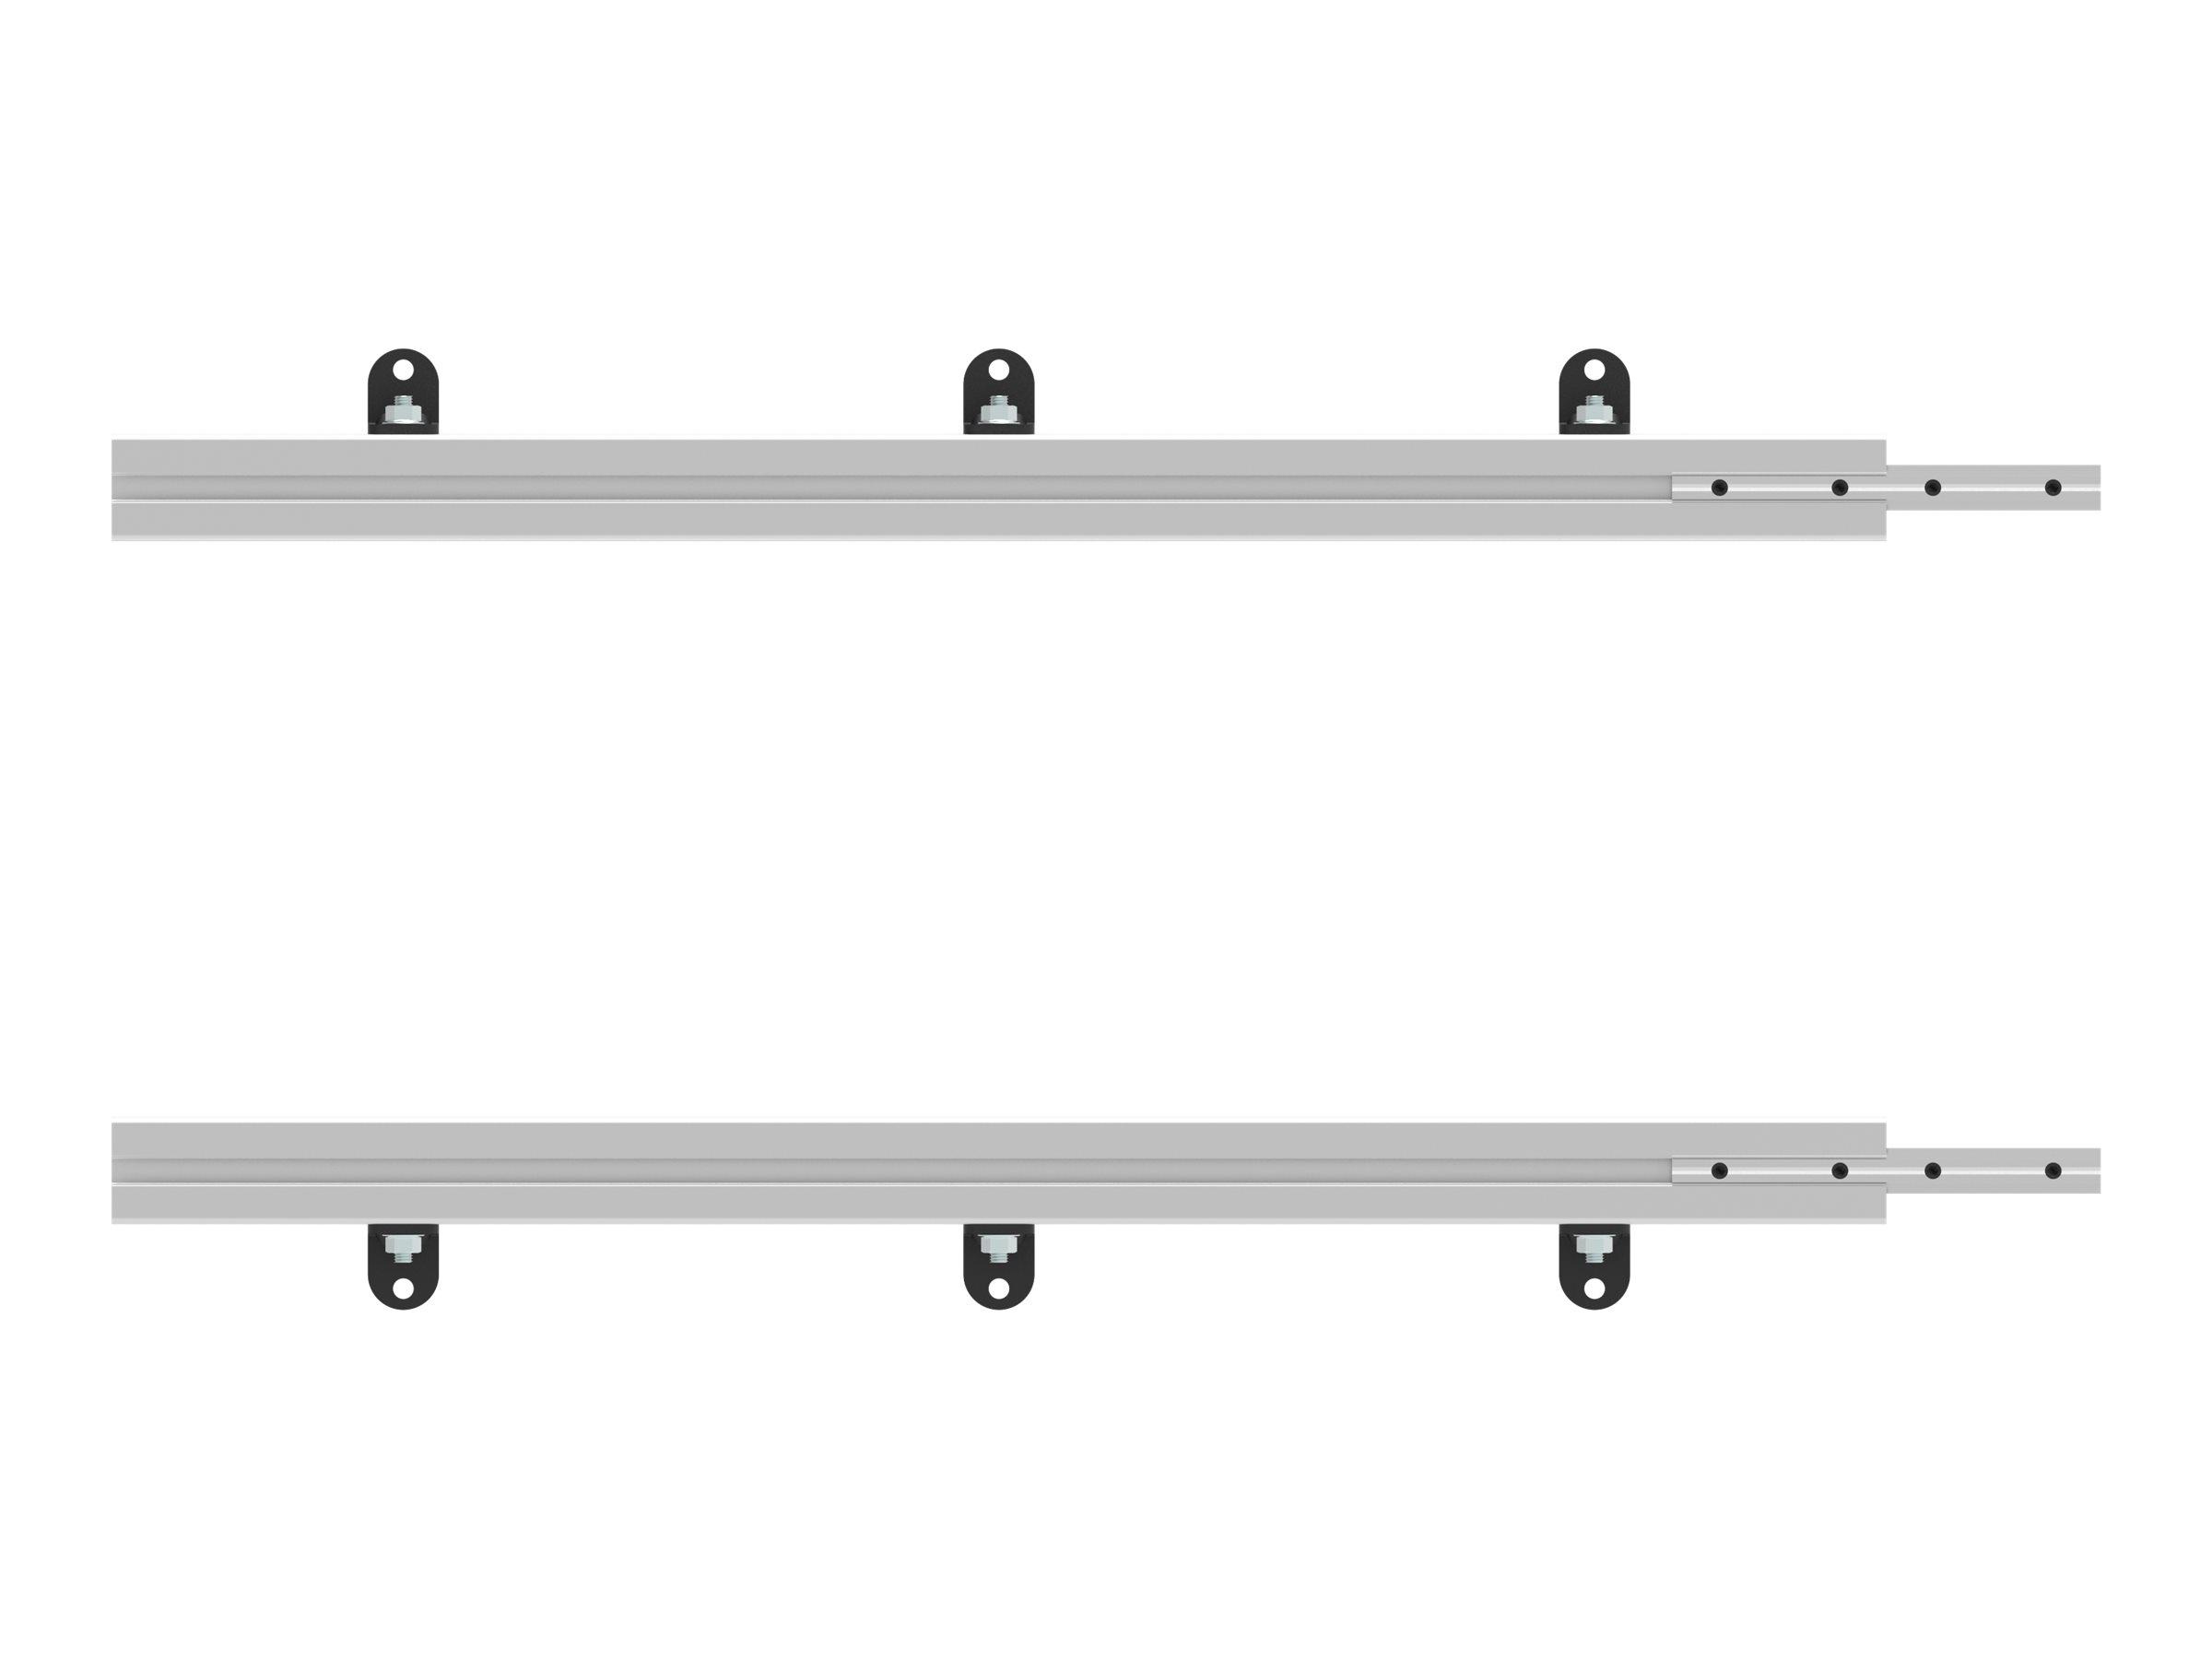 Vision - Montagekomponente (2 Schienen) - stranggepresstes Aluminium